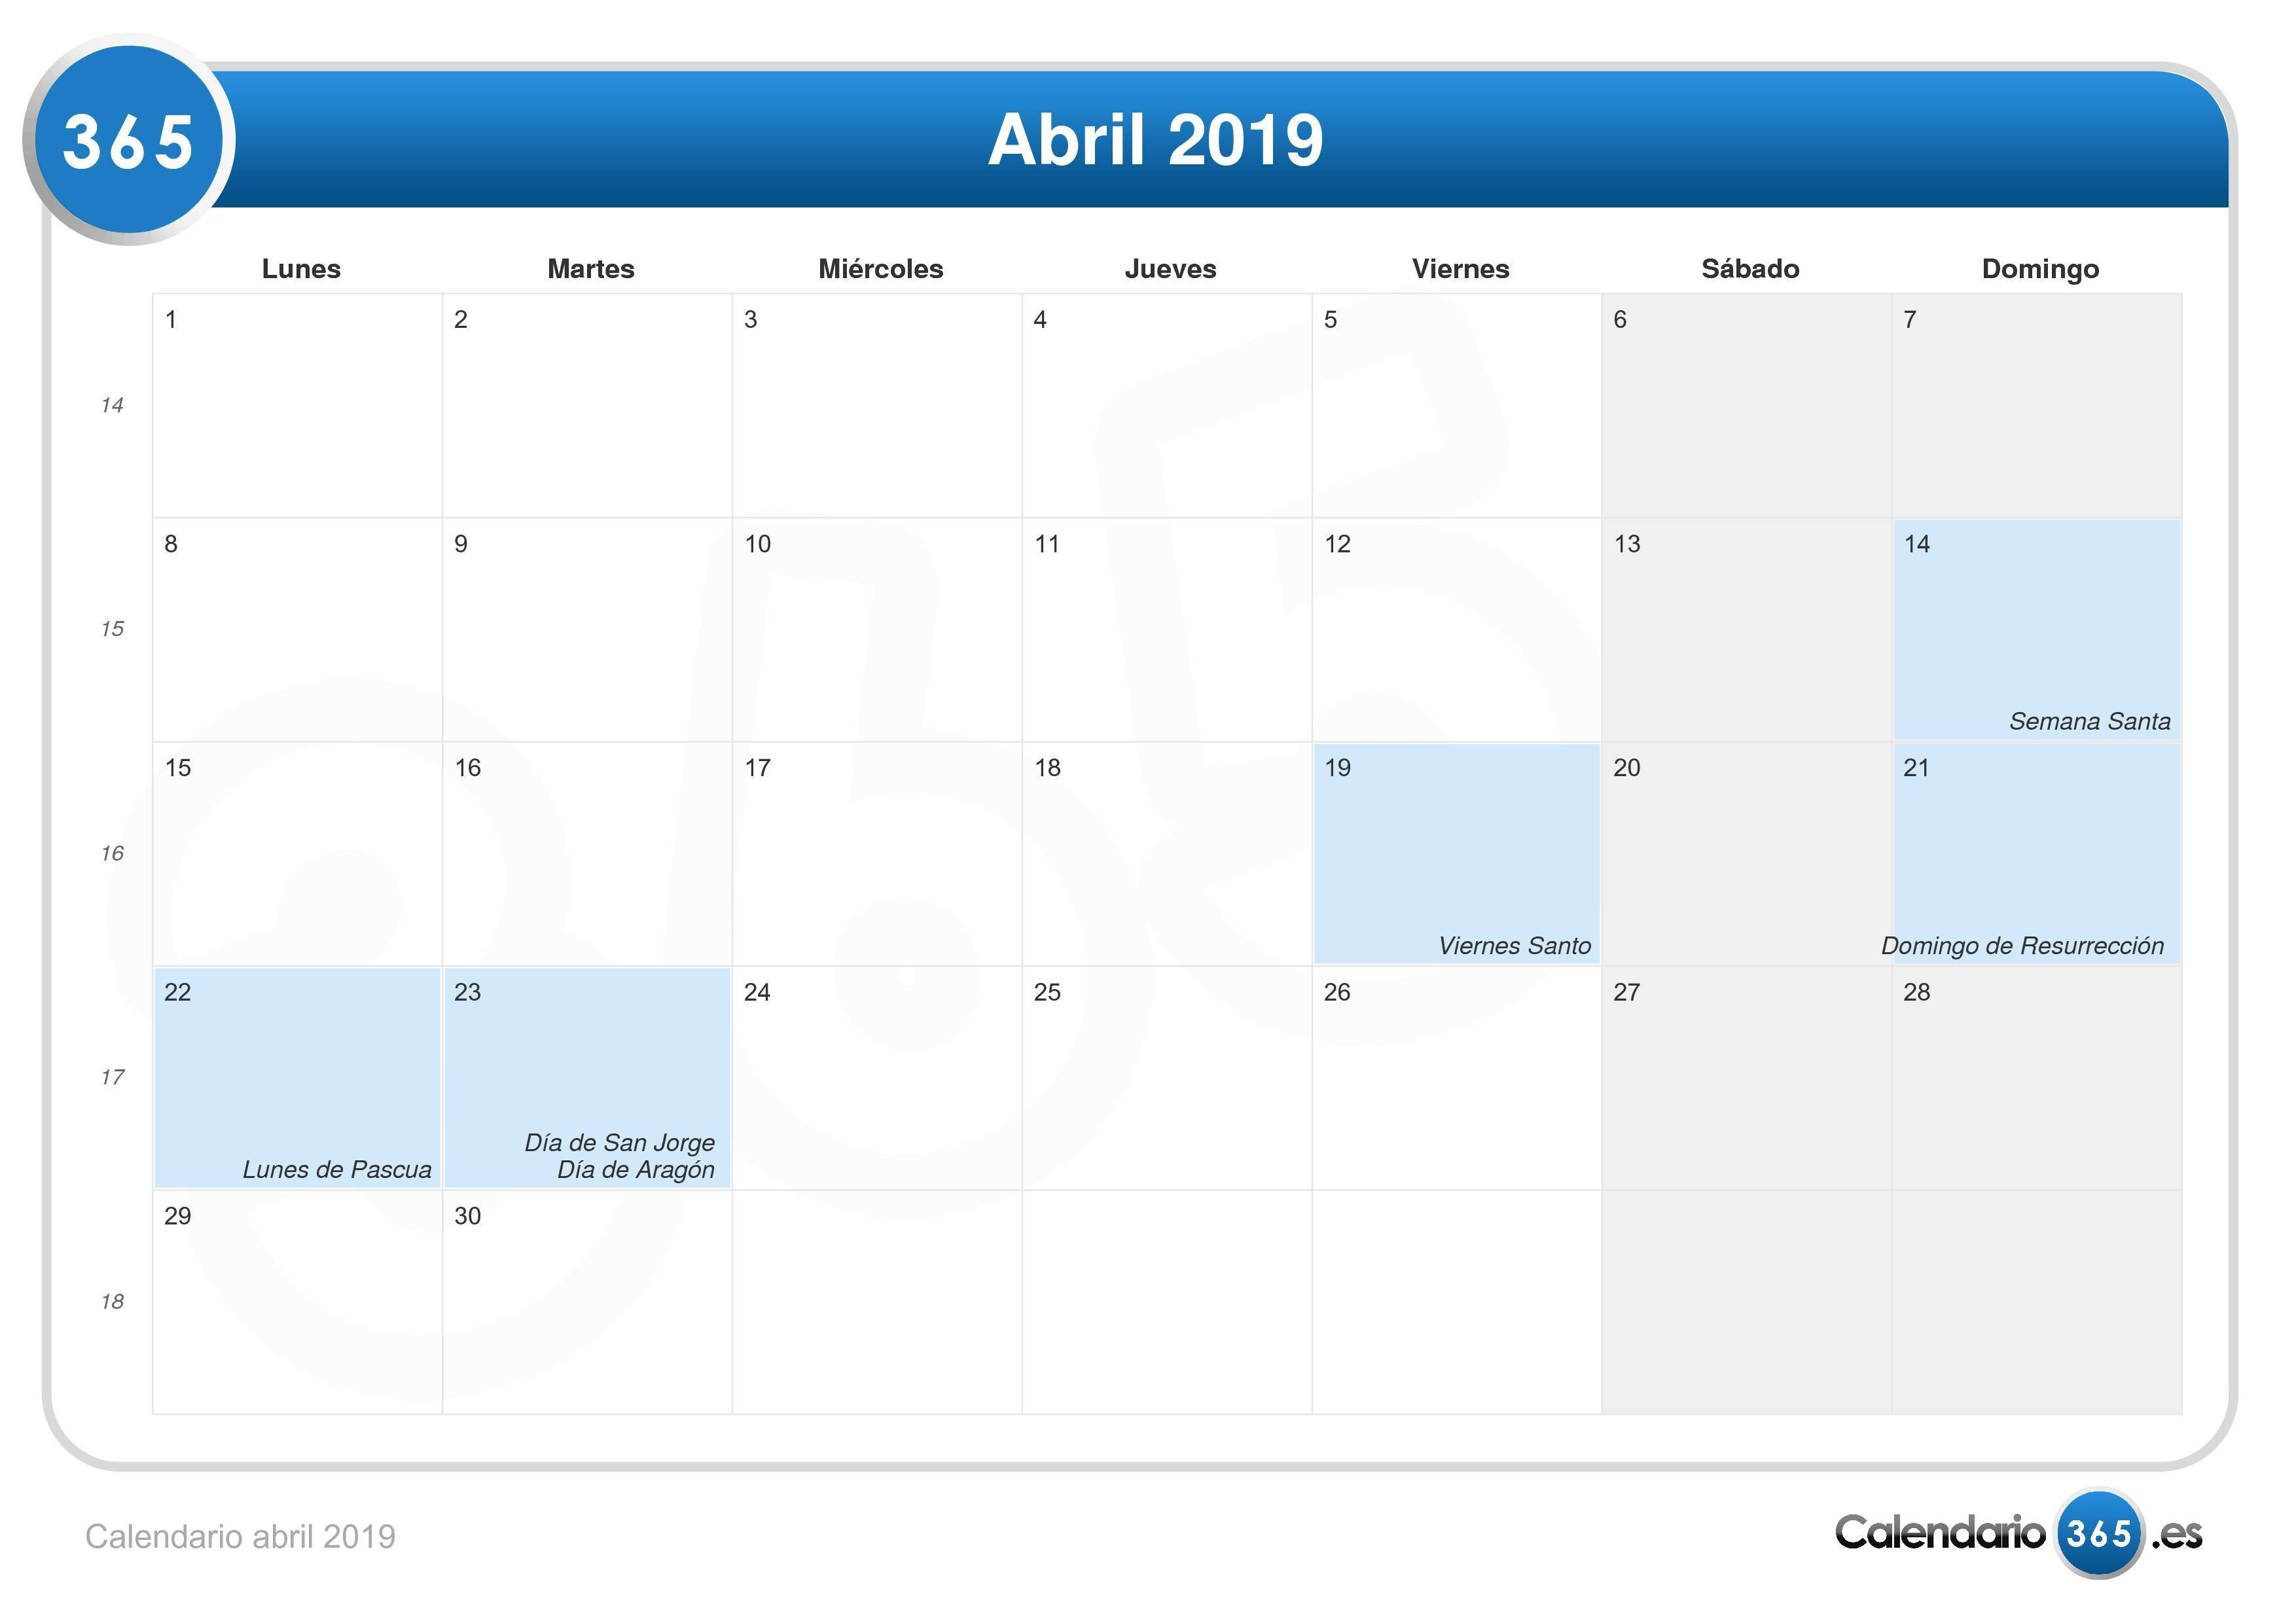 Calendario Escolar 2019 Jaen Más Arriba-a-fecha Calendario Abril 2019 Of Calendario Escolar 2019 Jaen Más Recientemente Liberado Horarios Del Curso 2018 2019 – I E S Fuente De La Pe±a